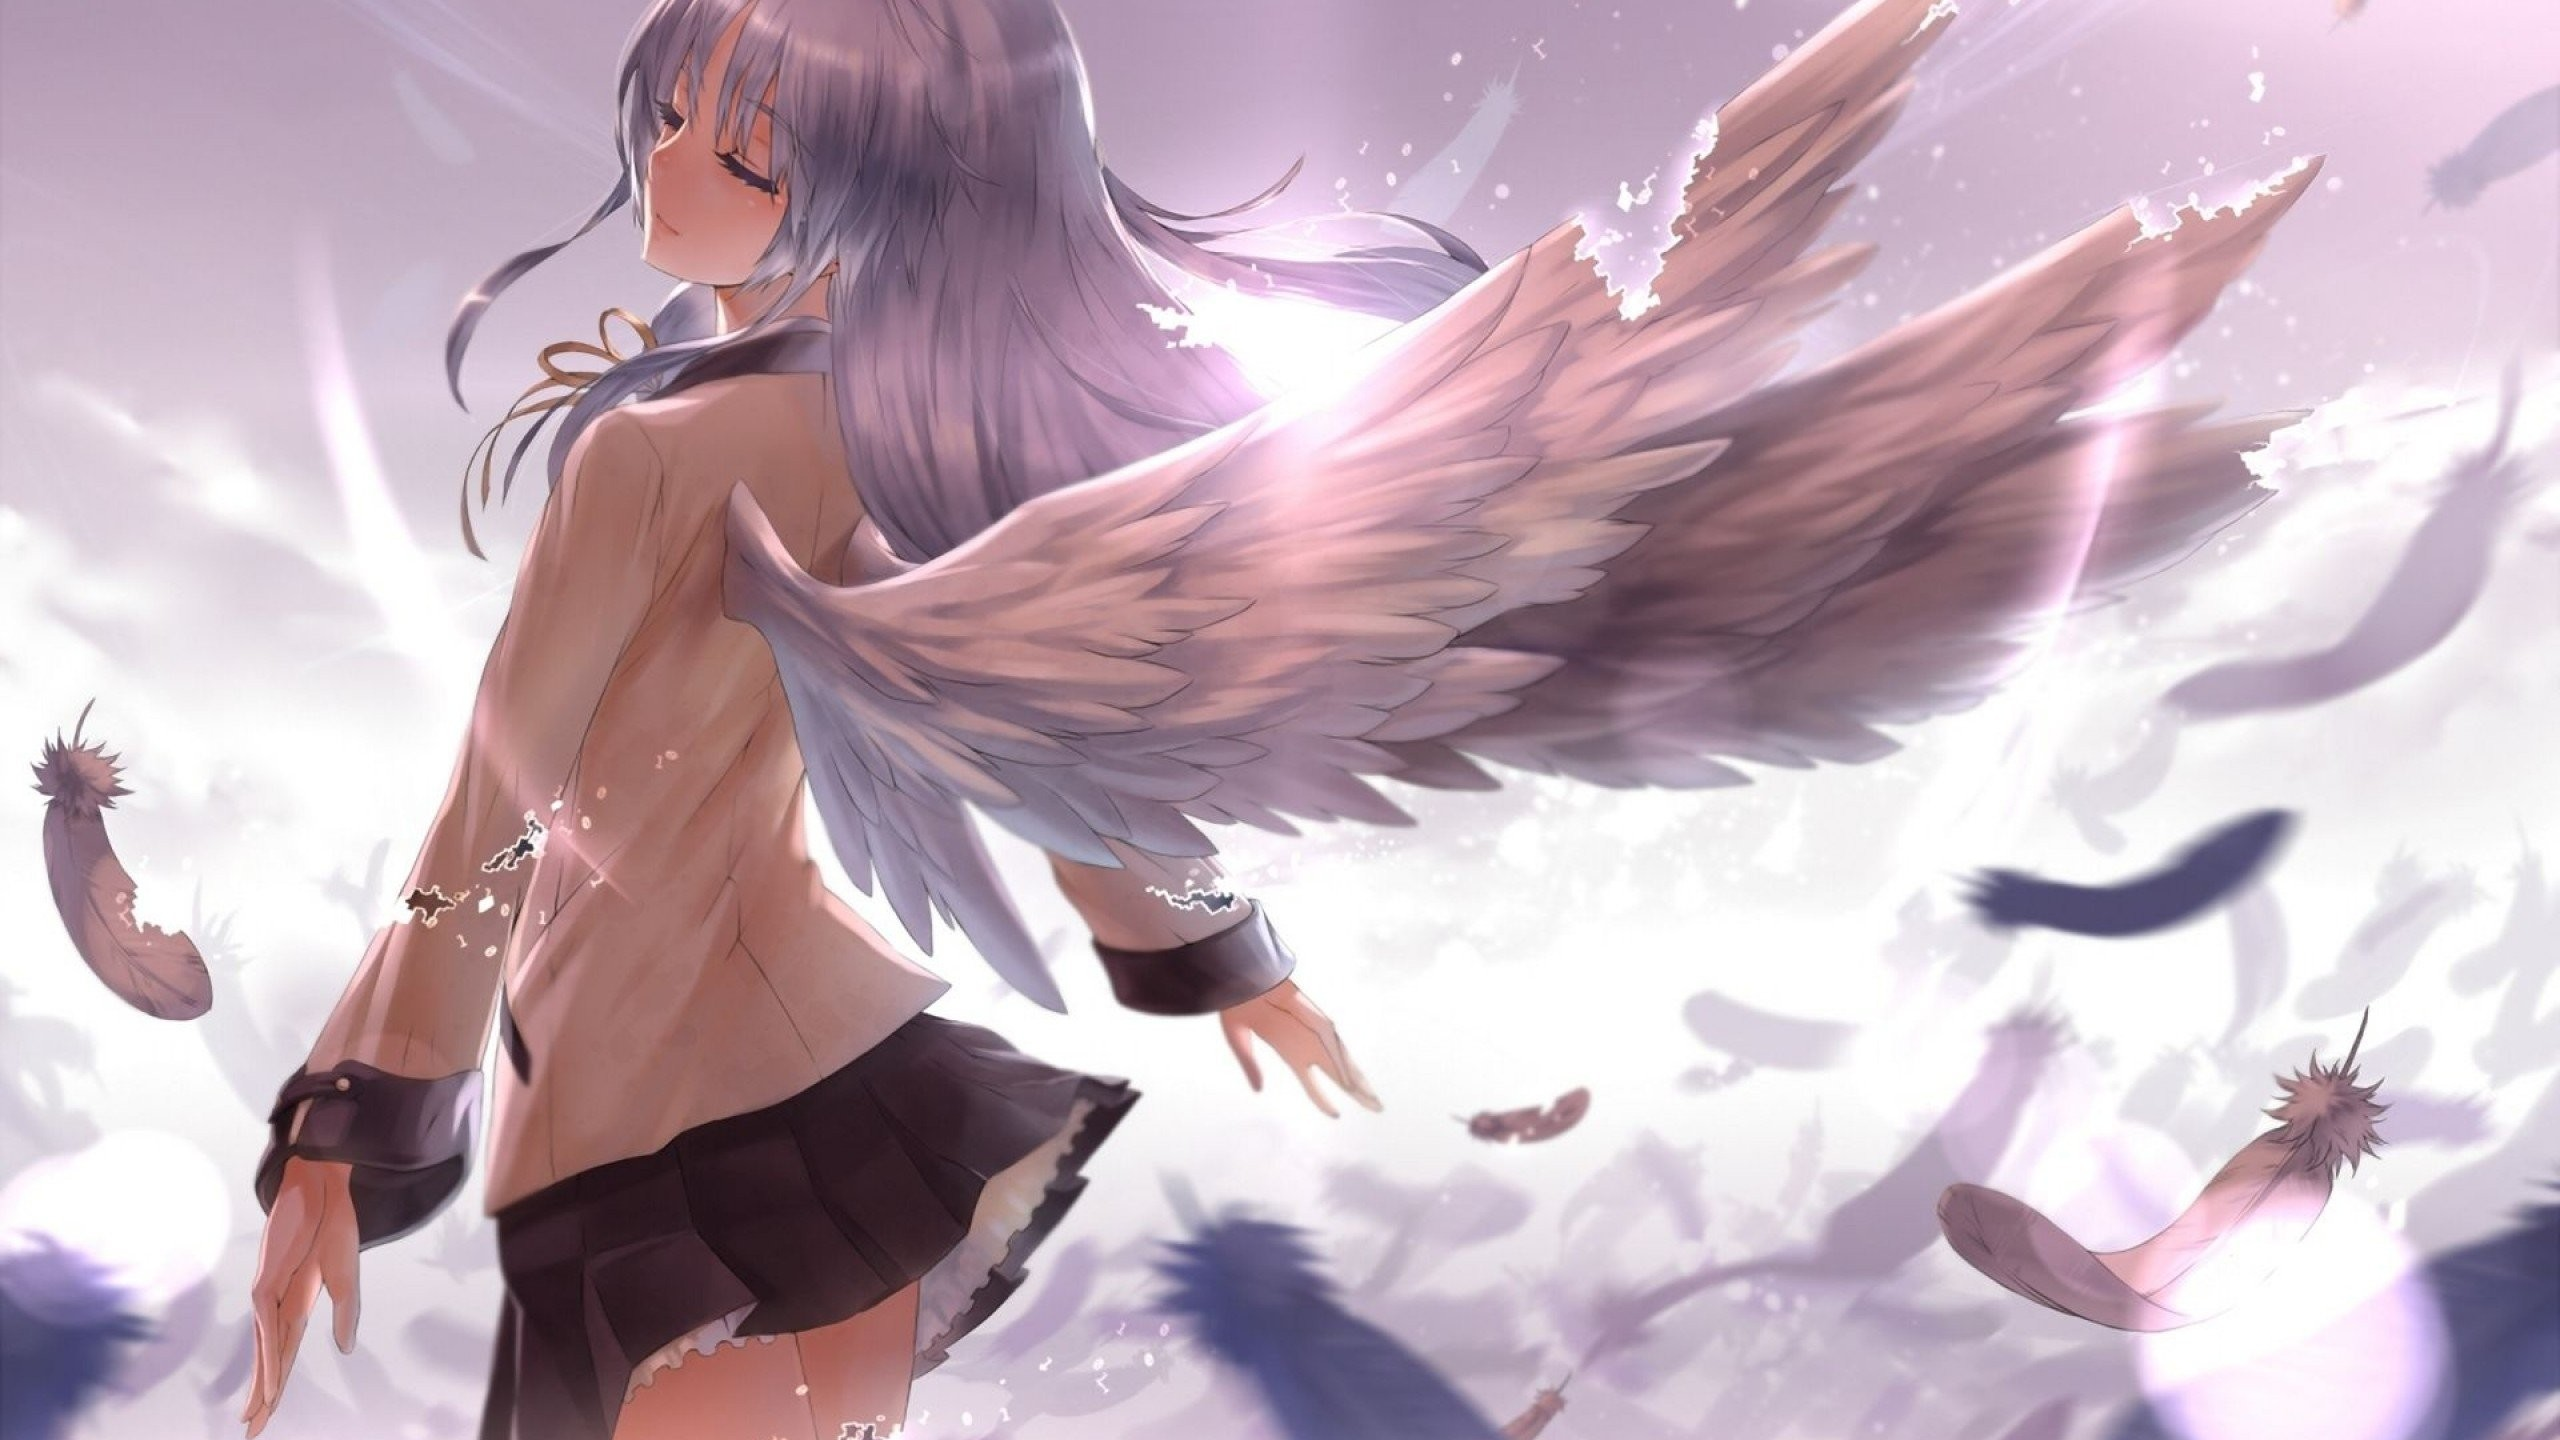 Wonderful-Anime-Phone-Picture